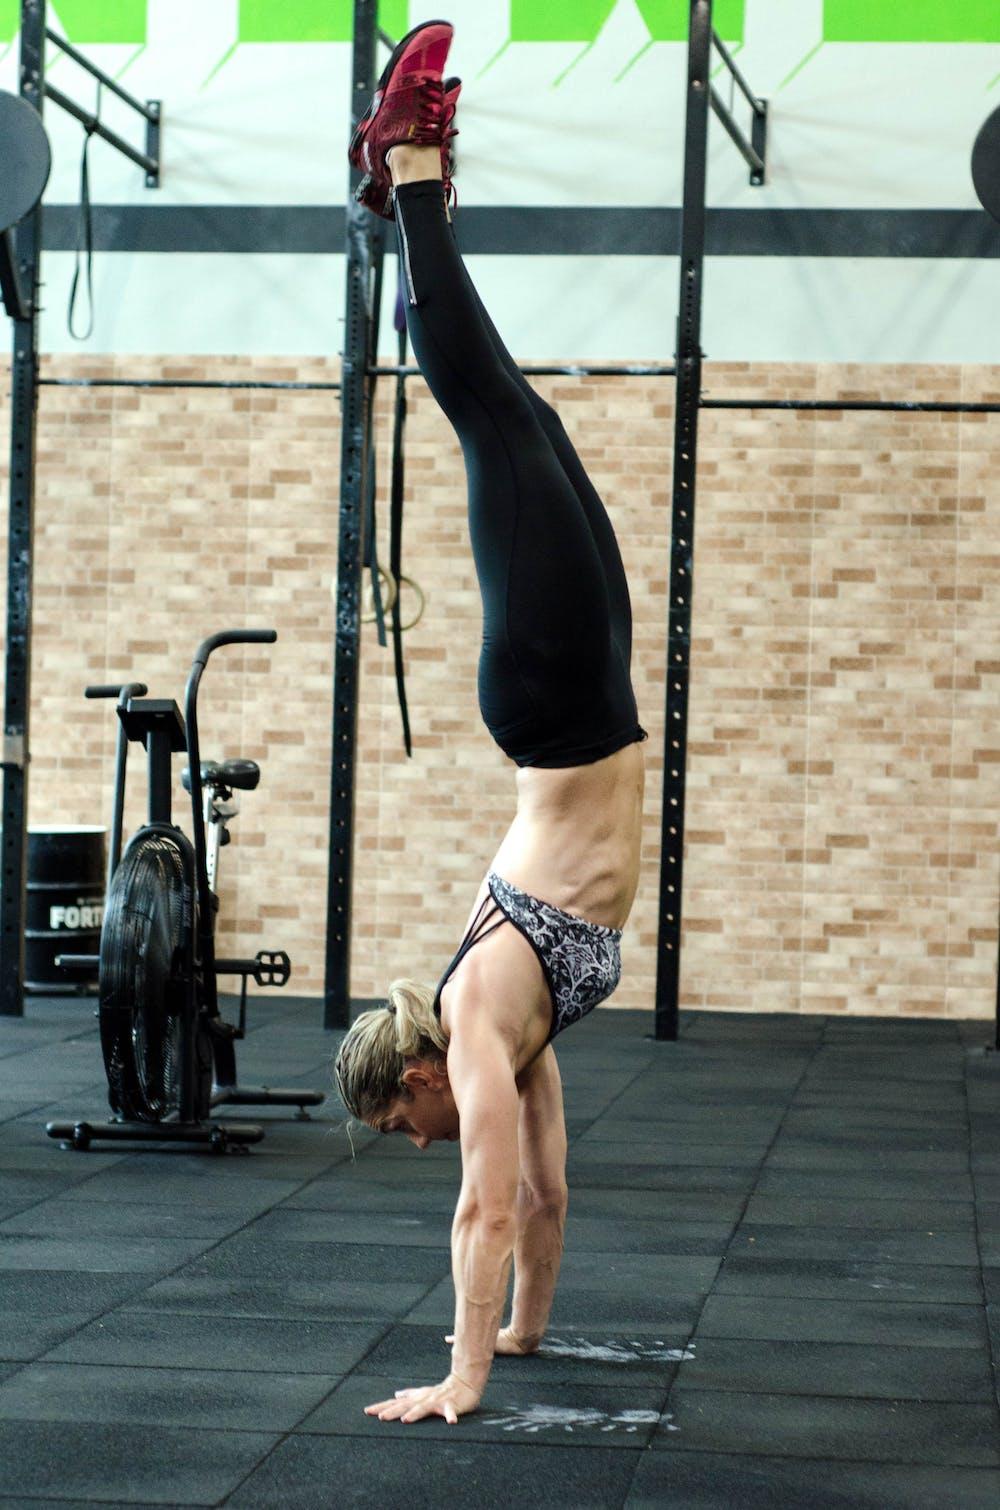 How Many Calories Does Hot Yoga Burn